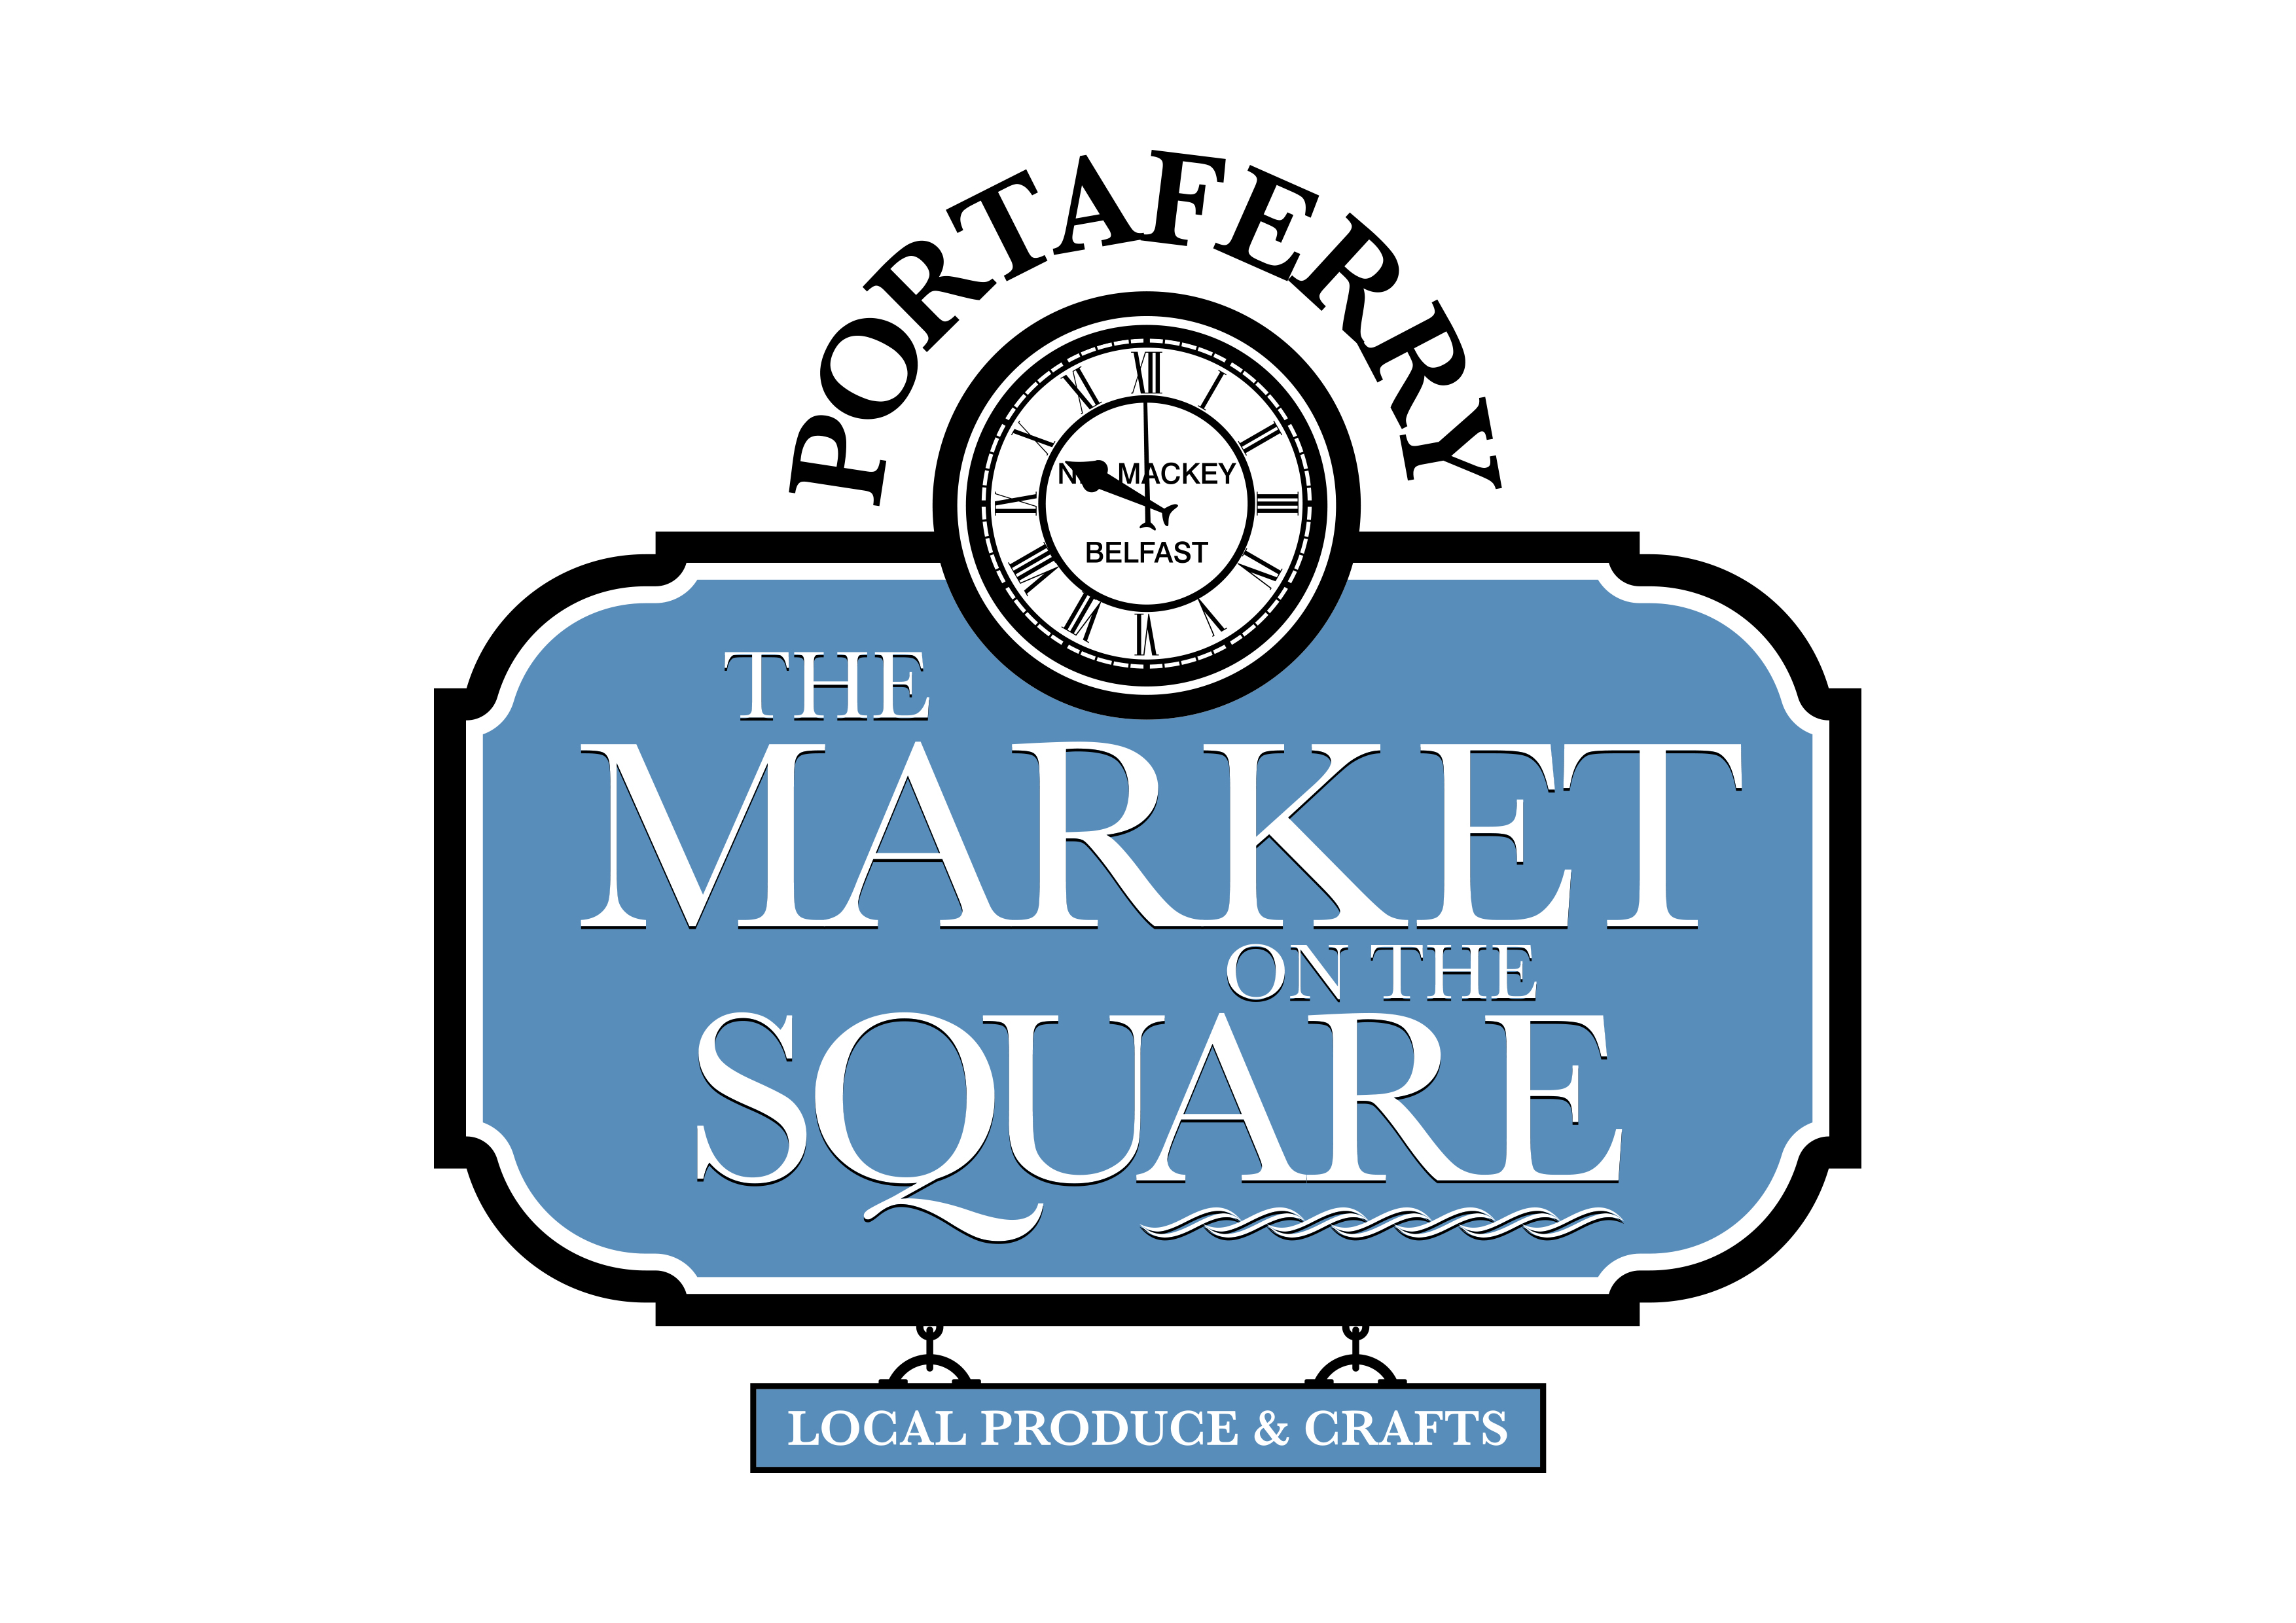 Portaferry Market